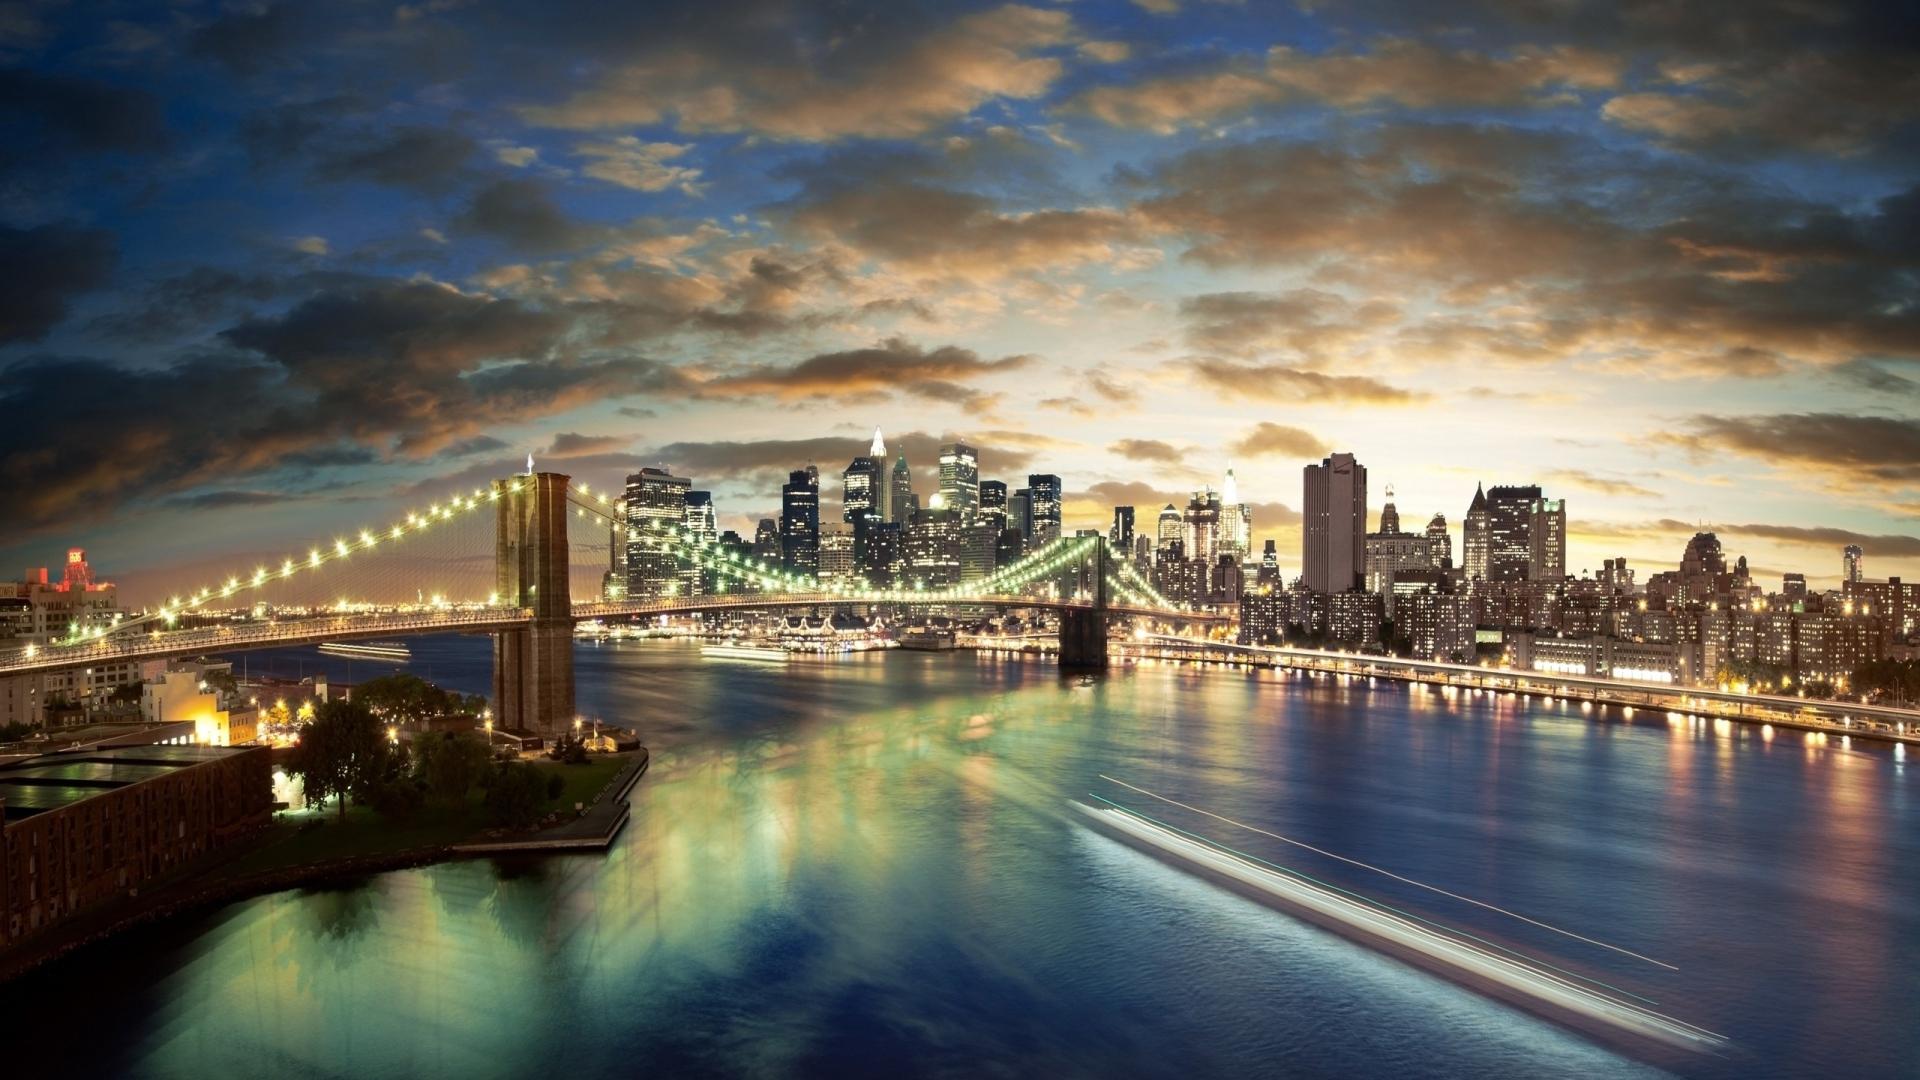 Most Inspiring Wallpaper City Background - city_buildings_bridges_clouds_sea_night_lights_landscape_58848_1920x1080  Picture_7035100 .jpg